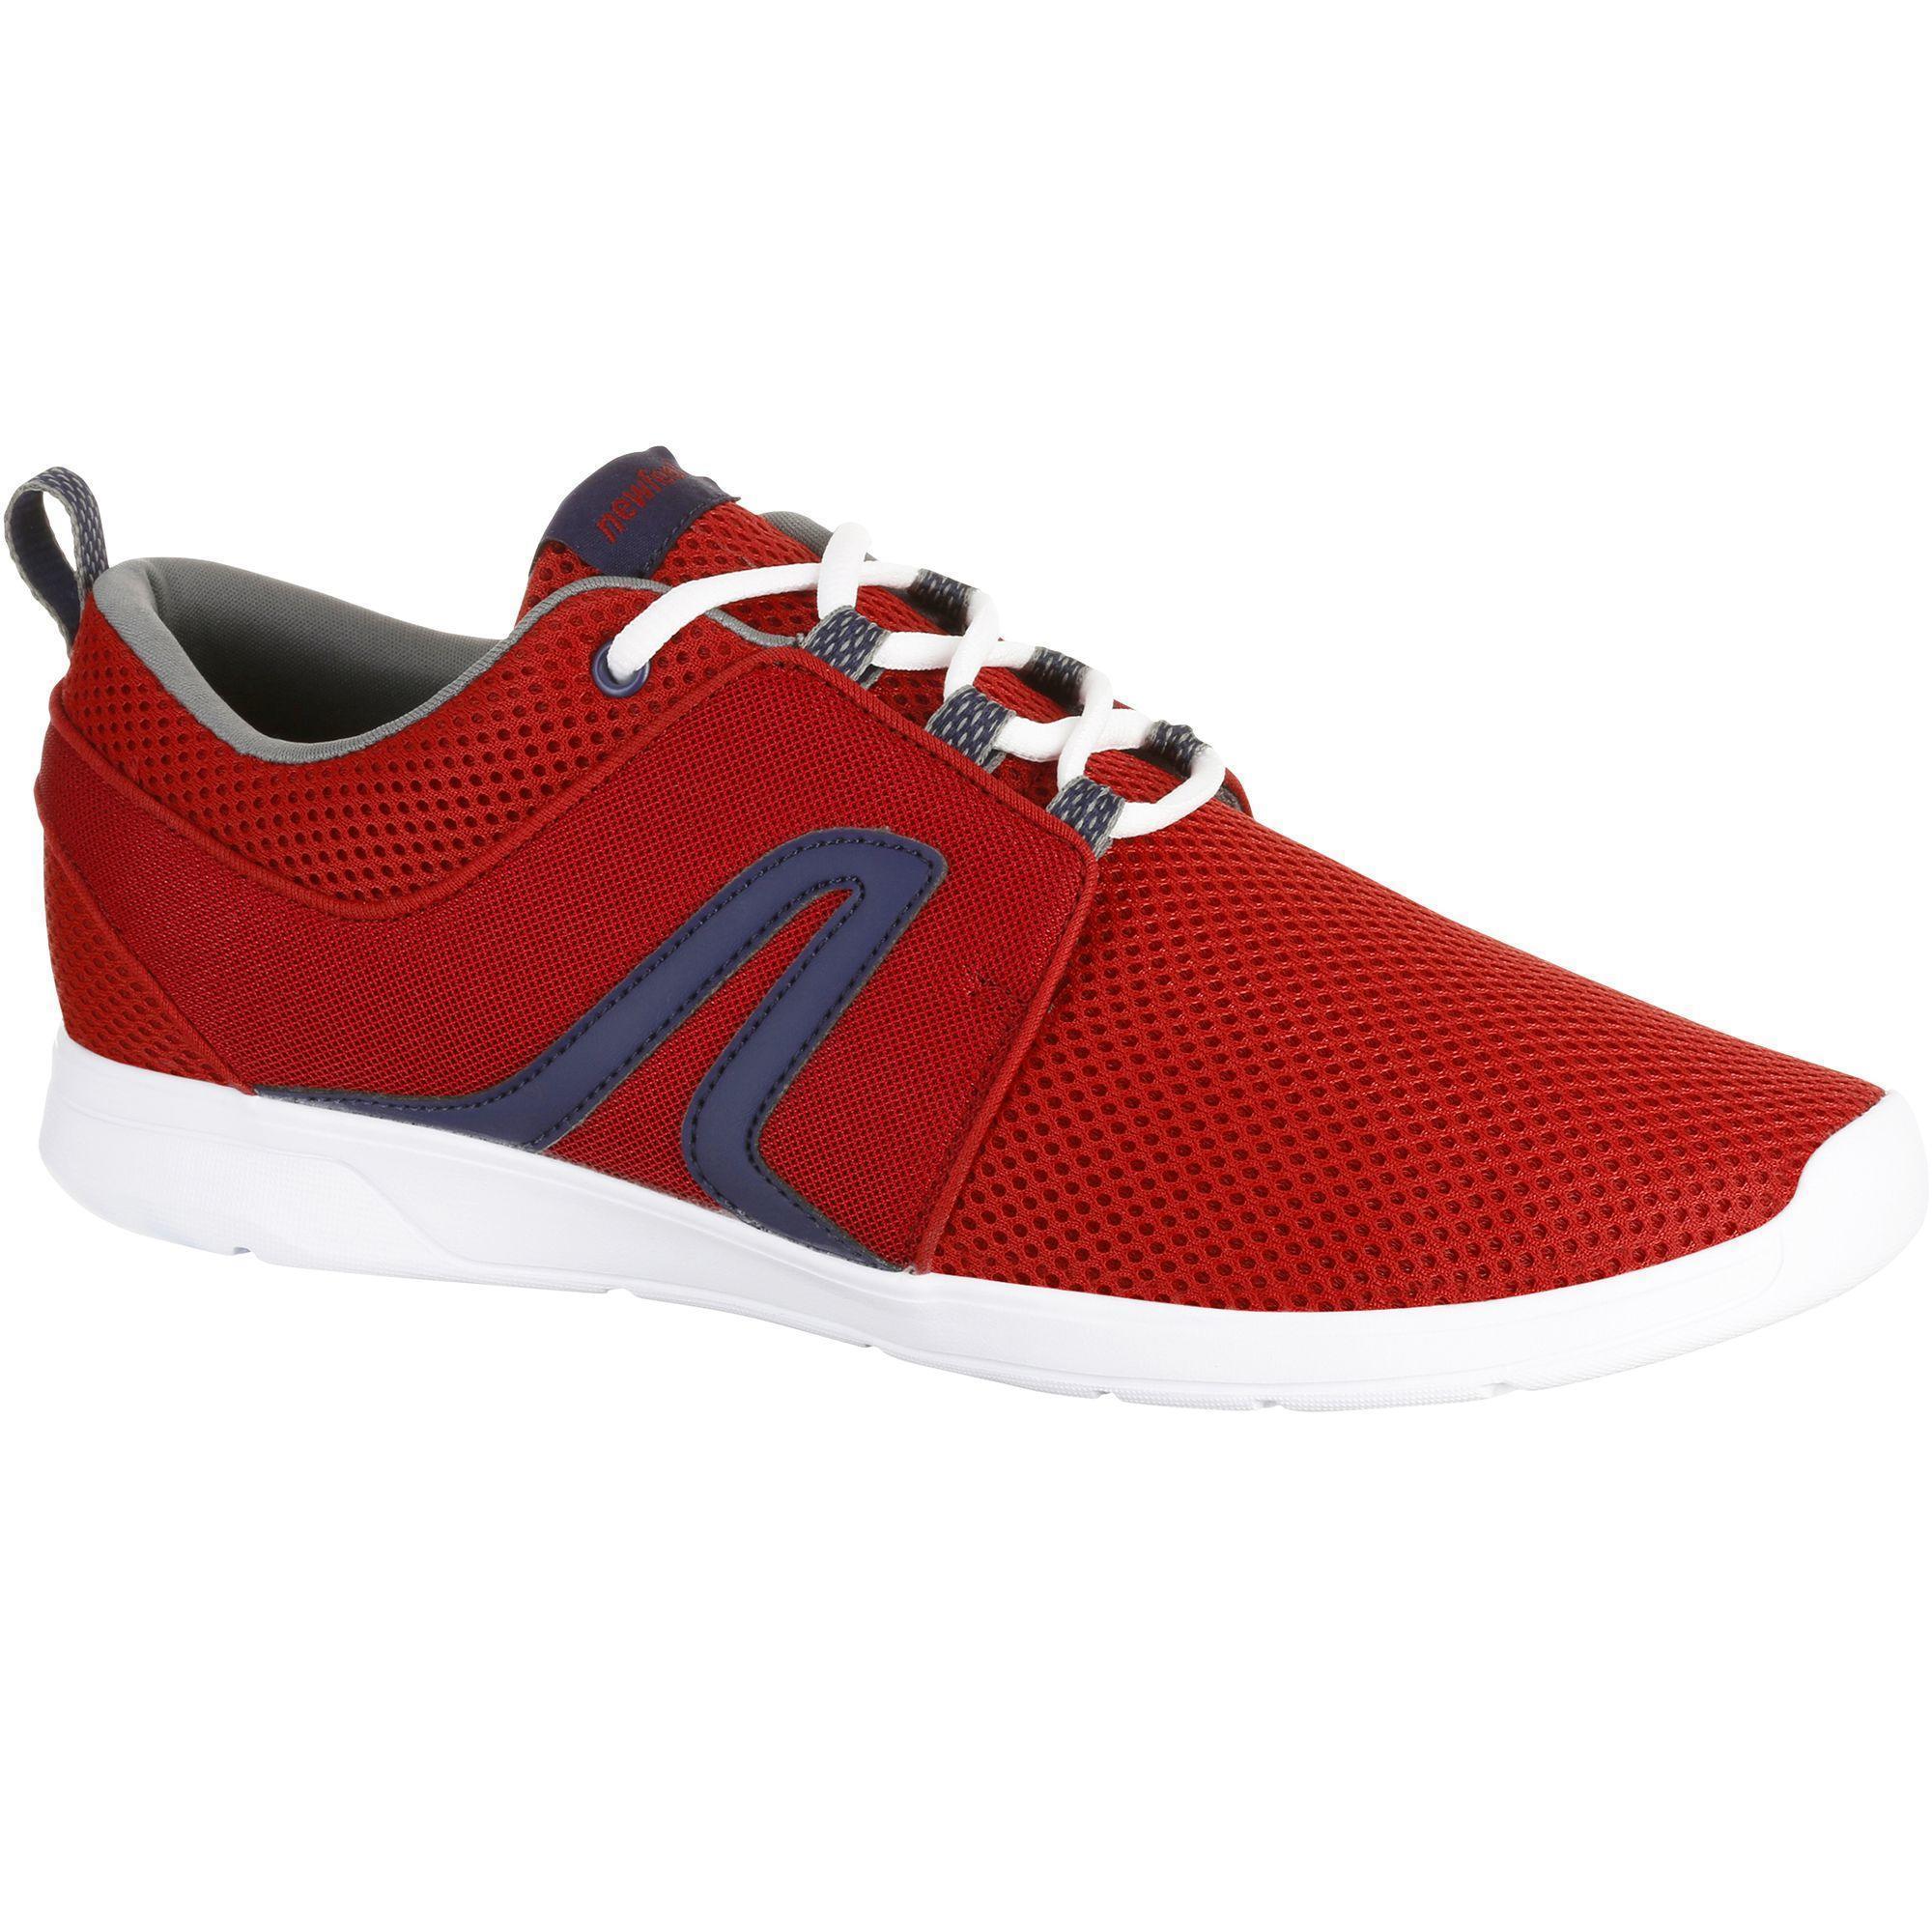 Chaussures newfeel femme decathlon - Chaussures de securite decathlon ...